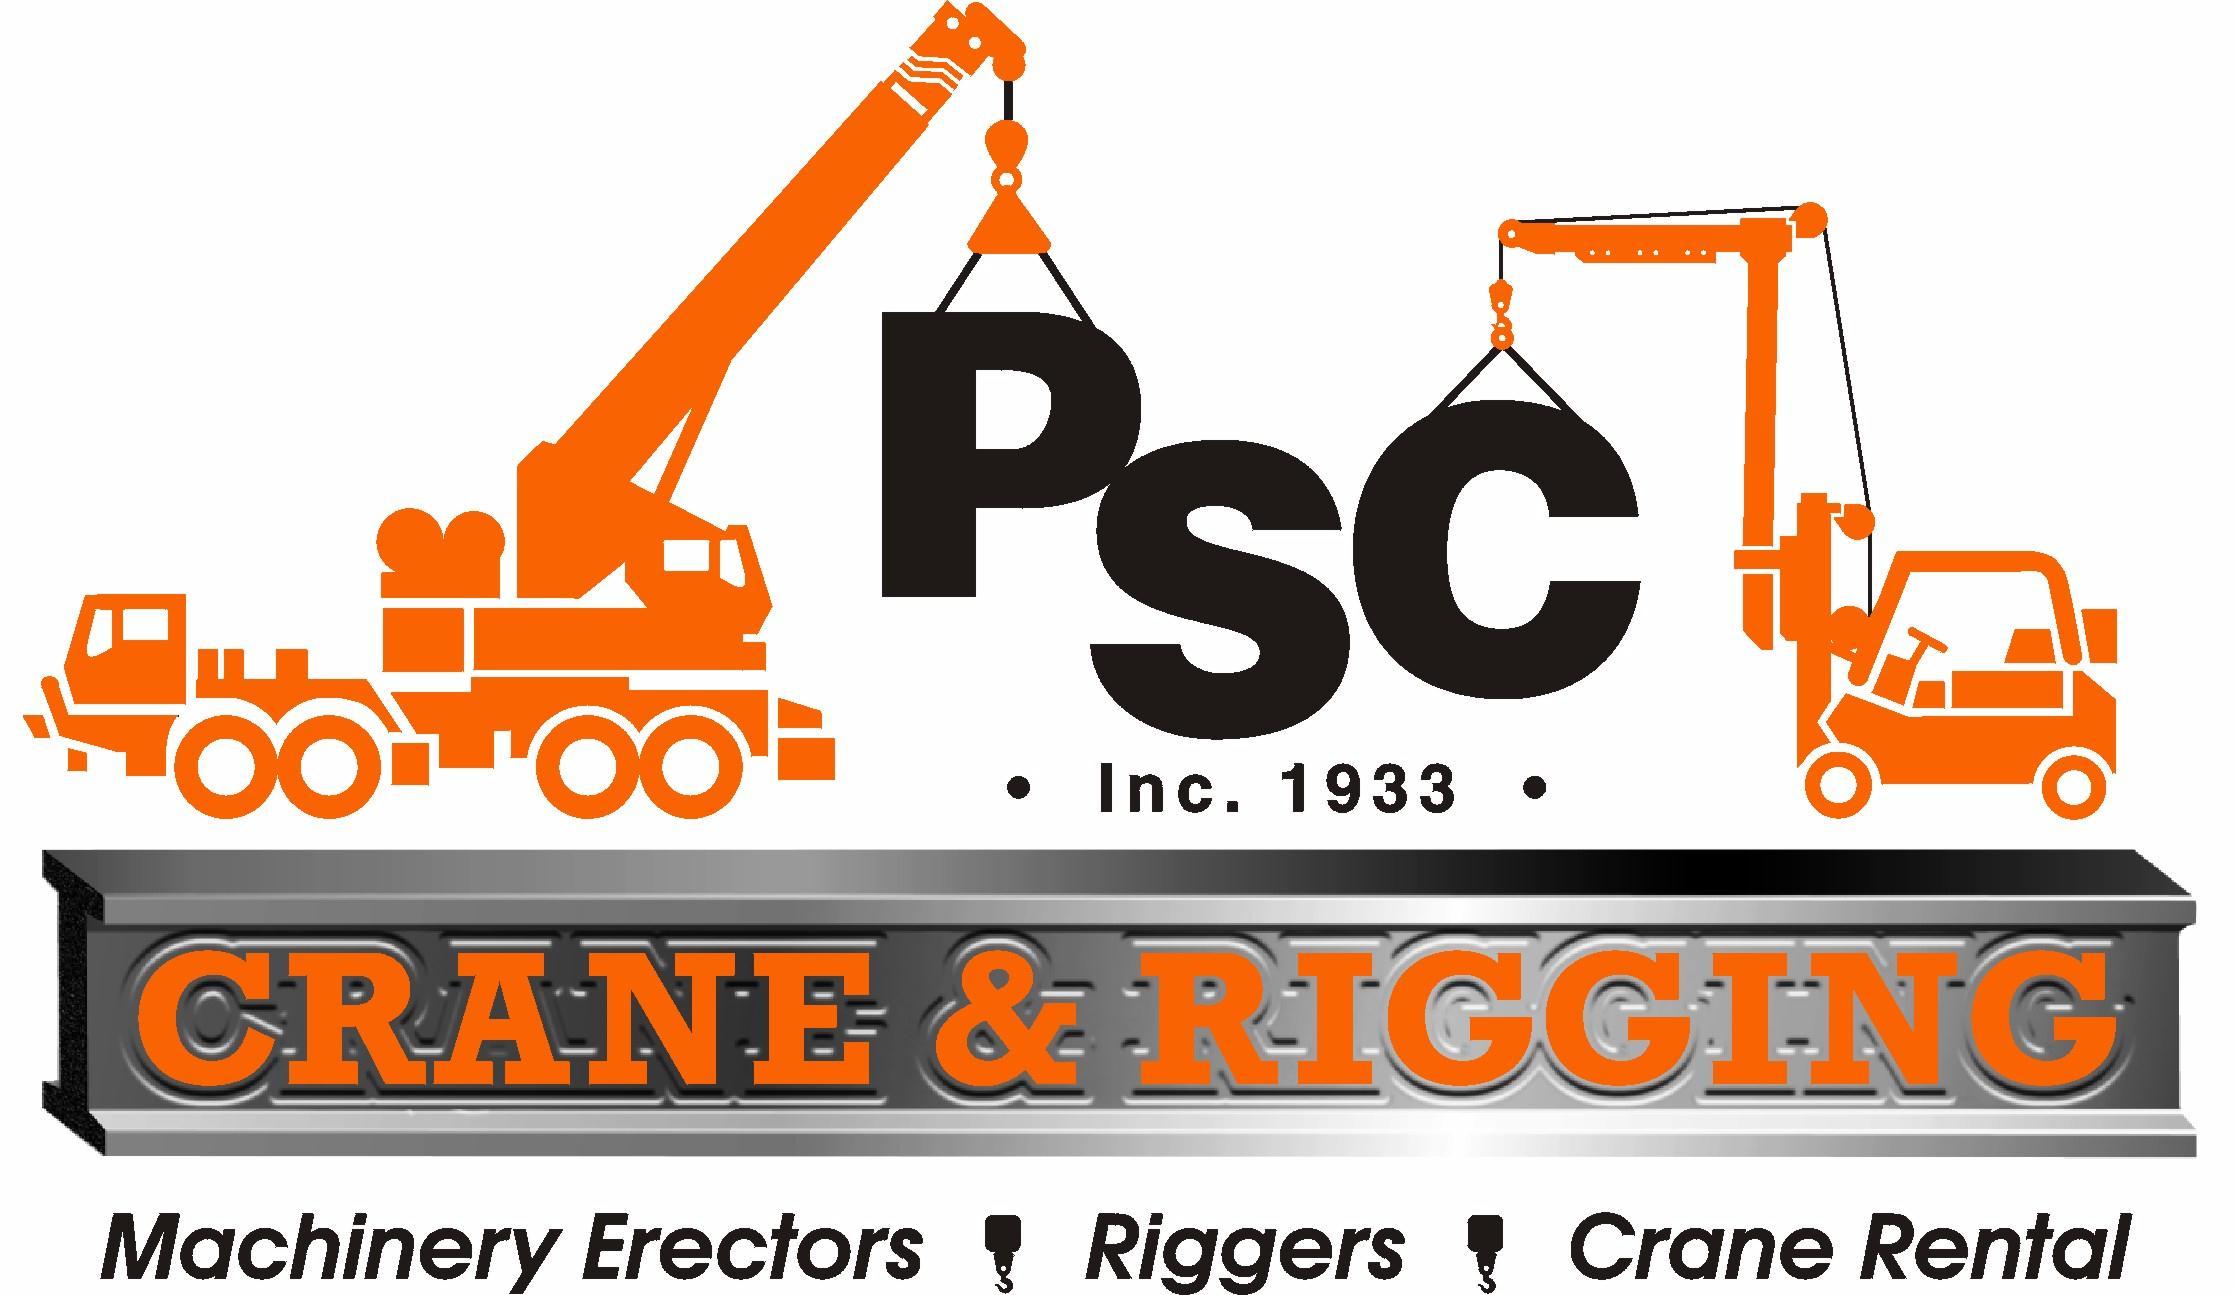 PCS Crane & Rigging